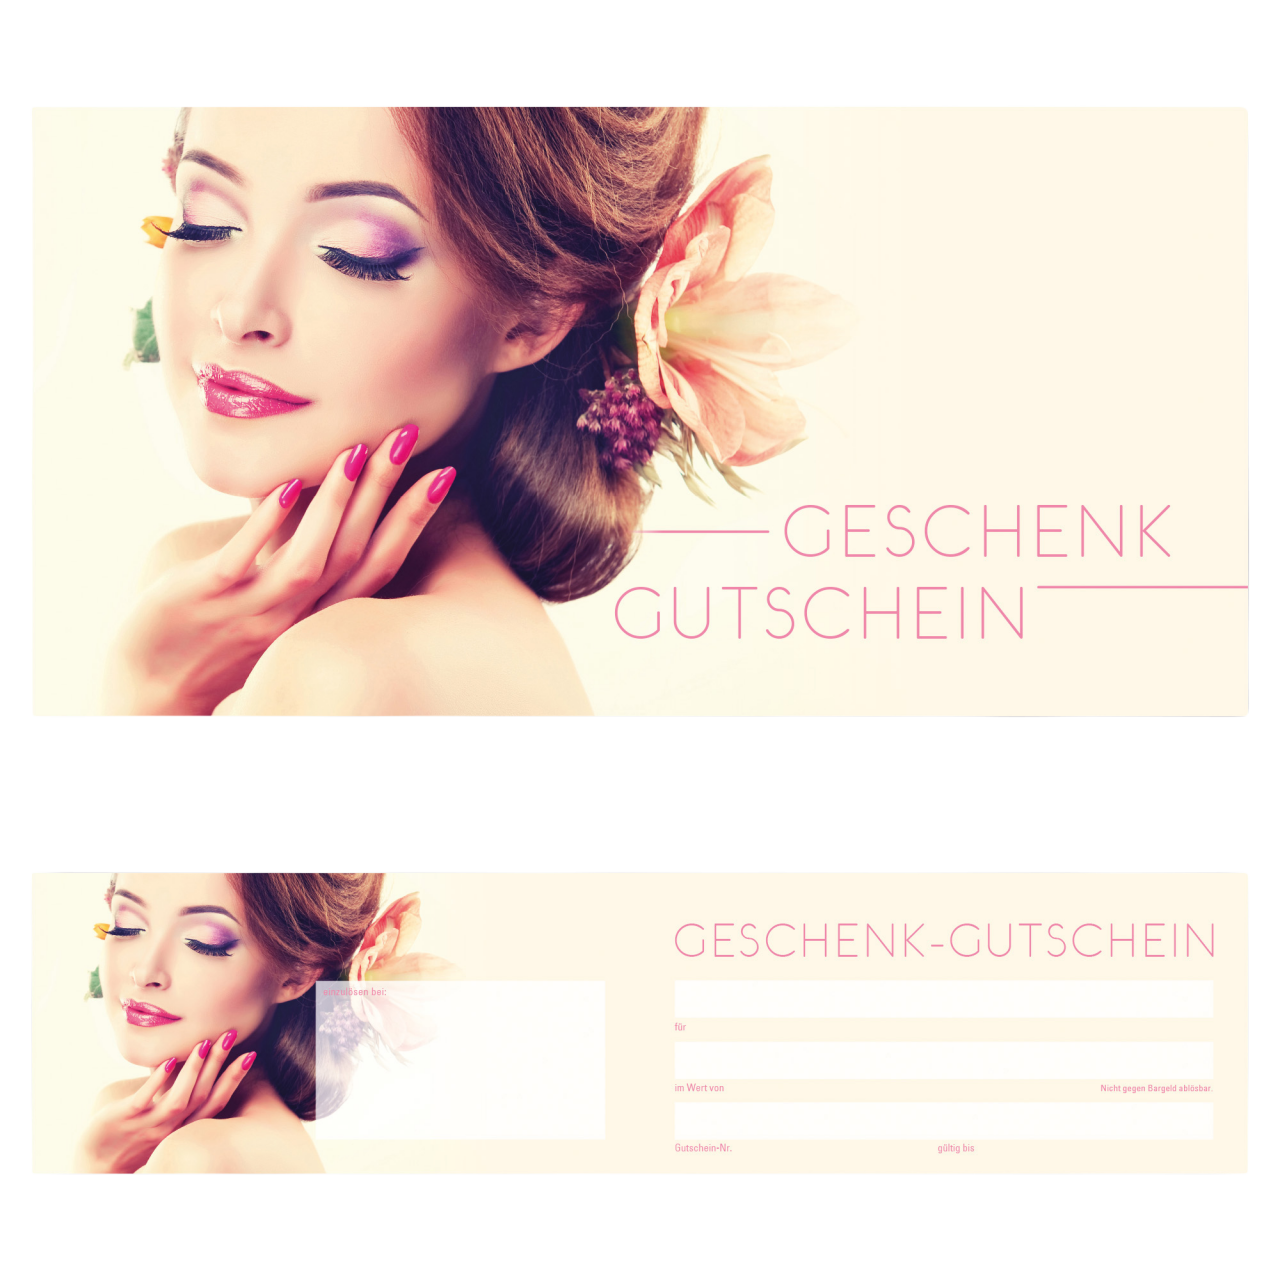 Geschenk-Gutschein Nails Frühling, 25 Stk. inkl. Kurverts pro Packung